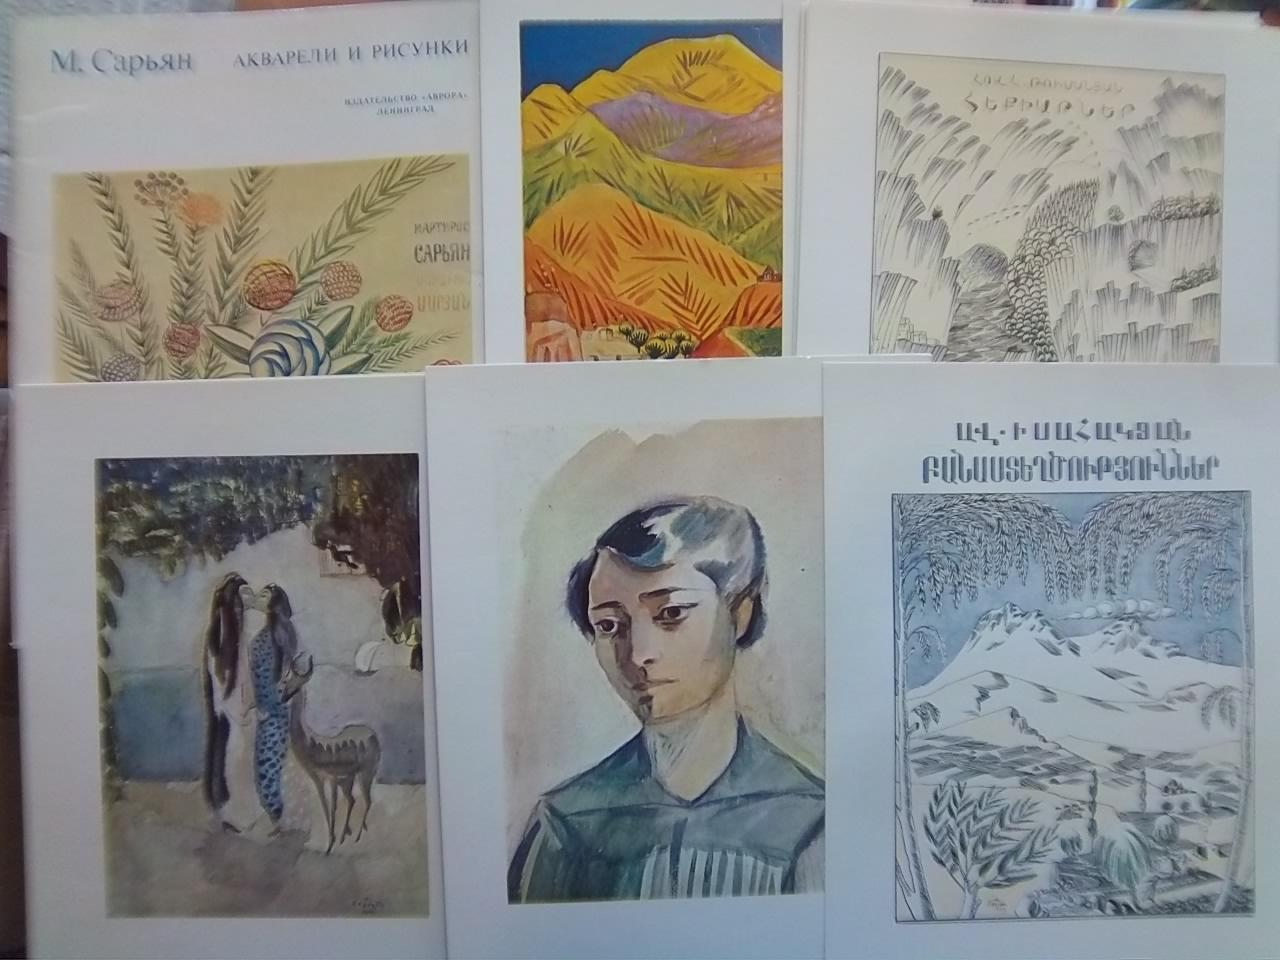 Акварели и рисунки МСарьяна (Репродукции)